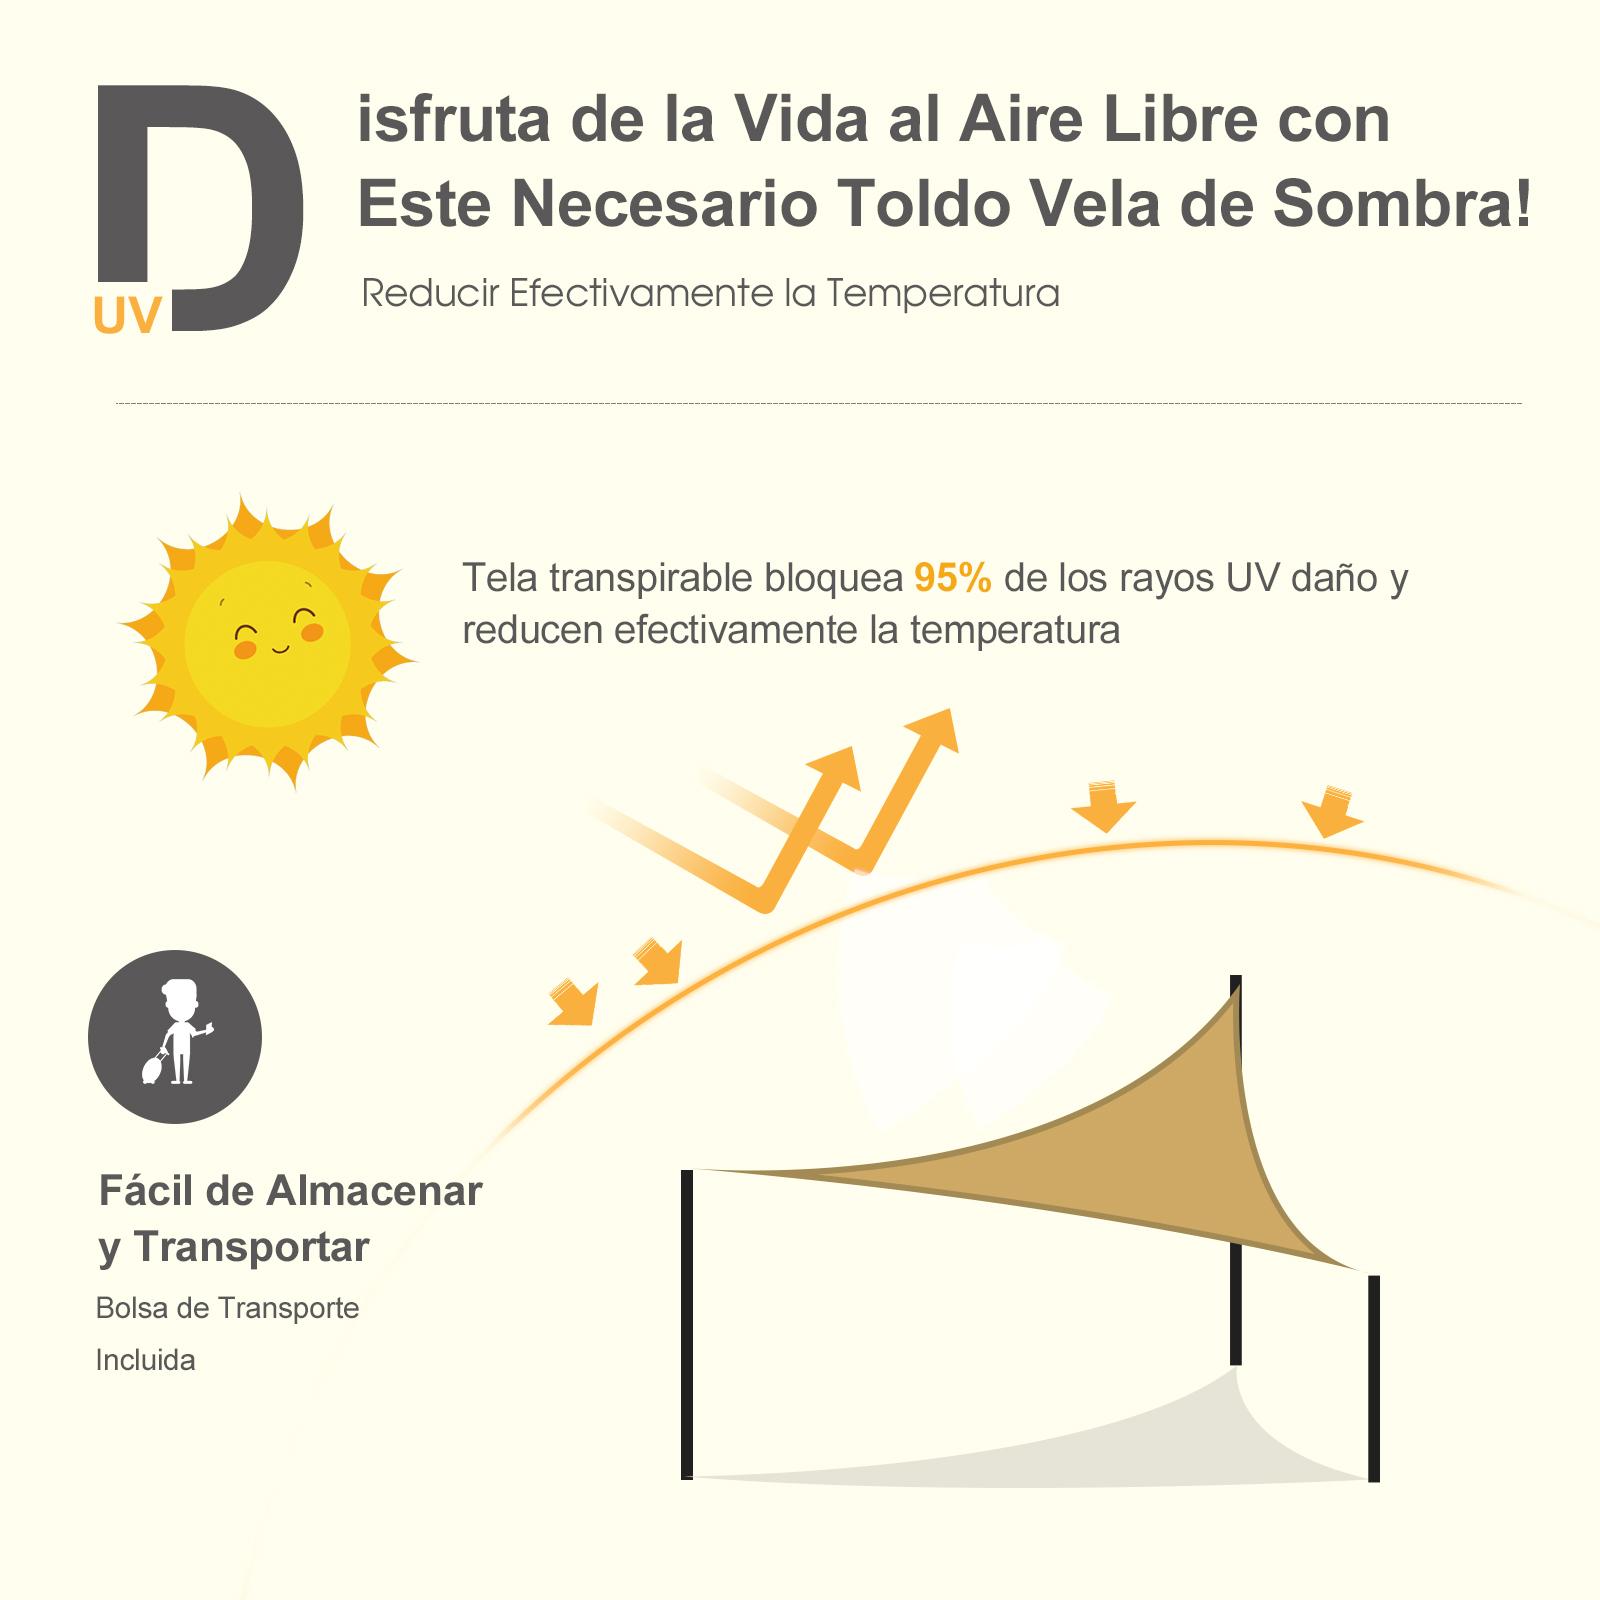 Toldo-Vela-Sombrilla-Parasol-Triangulo-Tejido-de-Poliester-160g-m2-Jardin-Playa miniatura 4